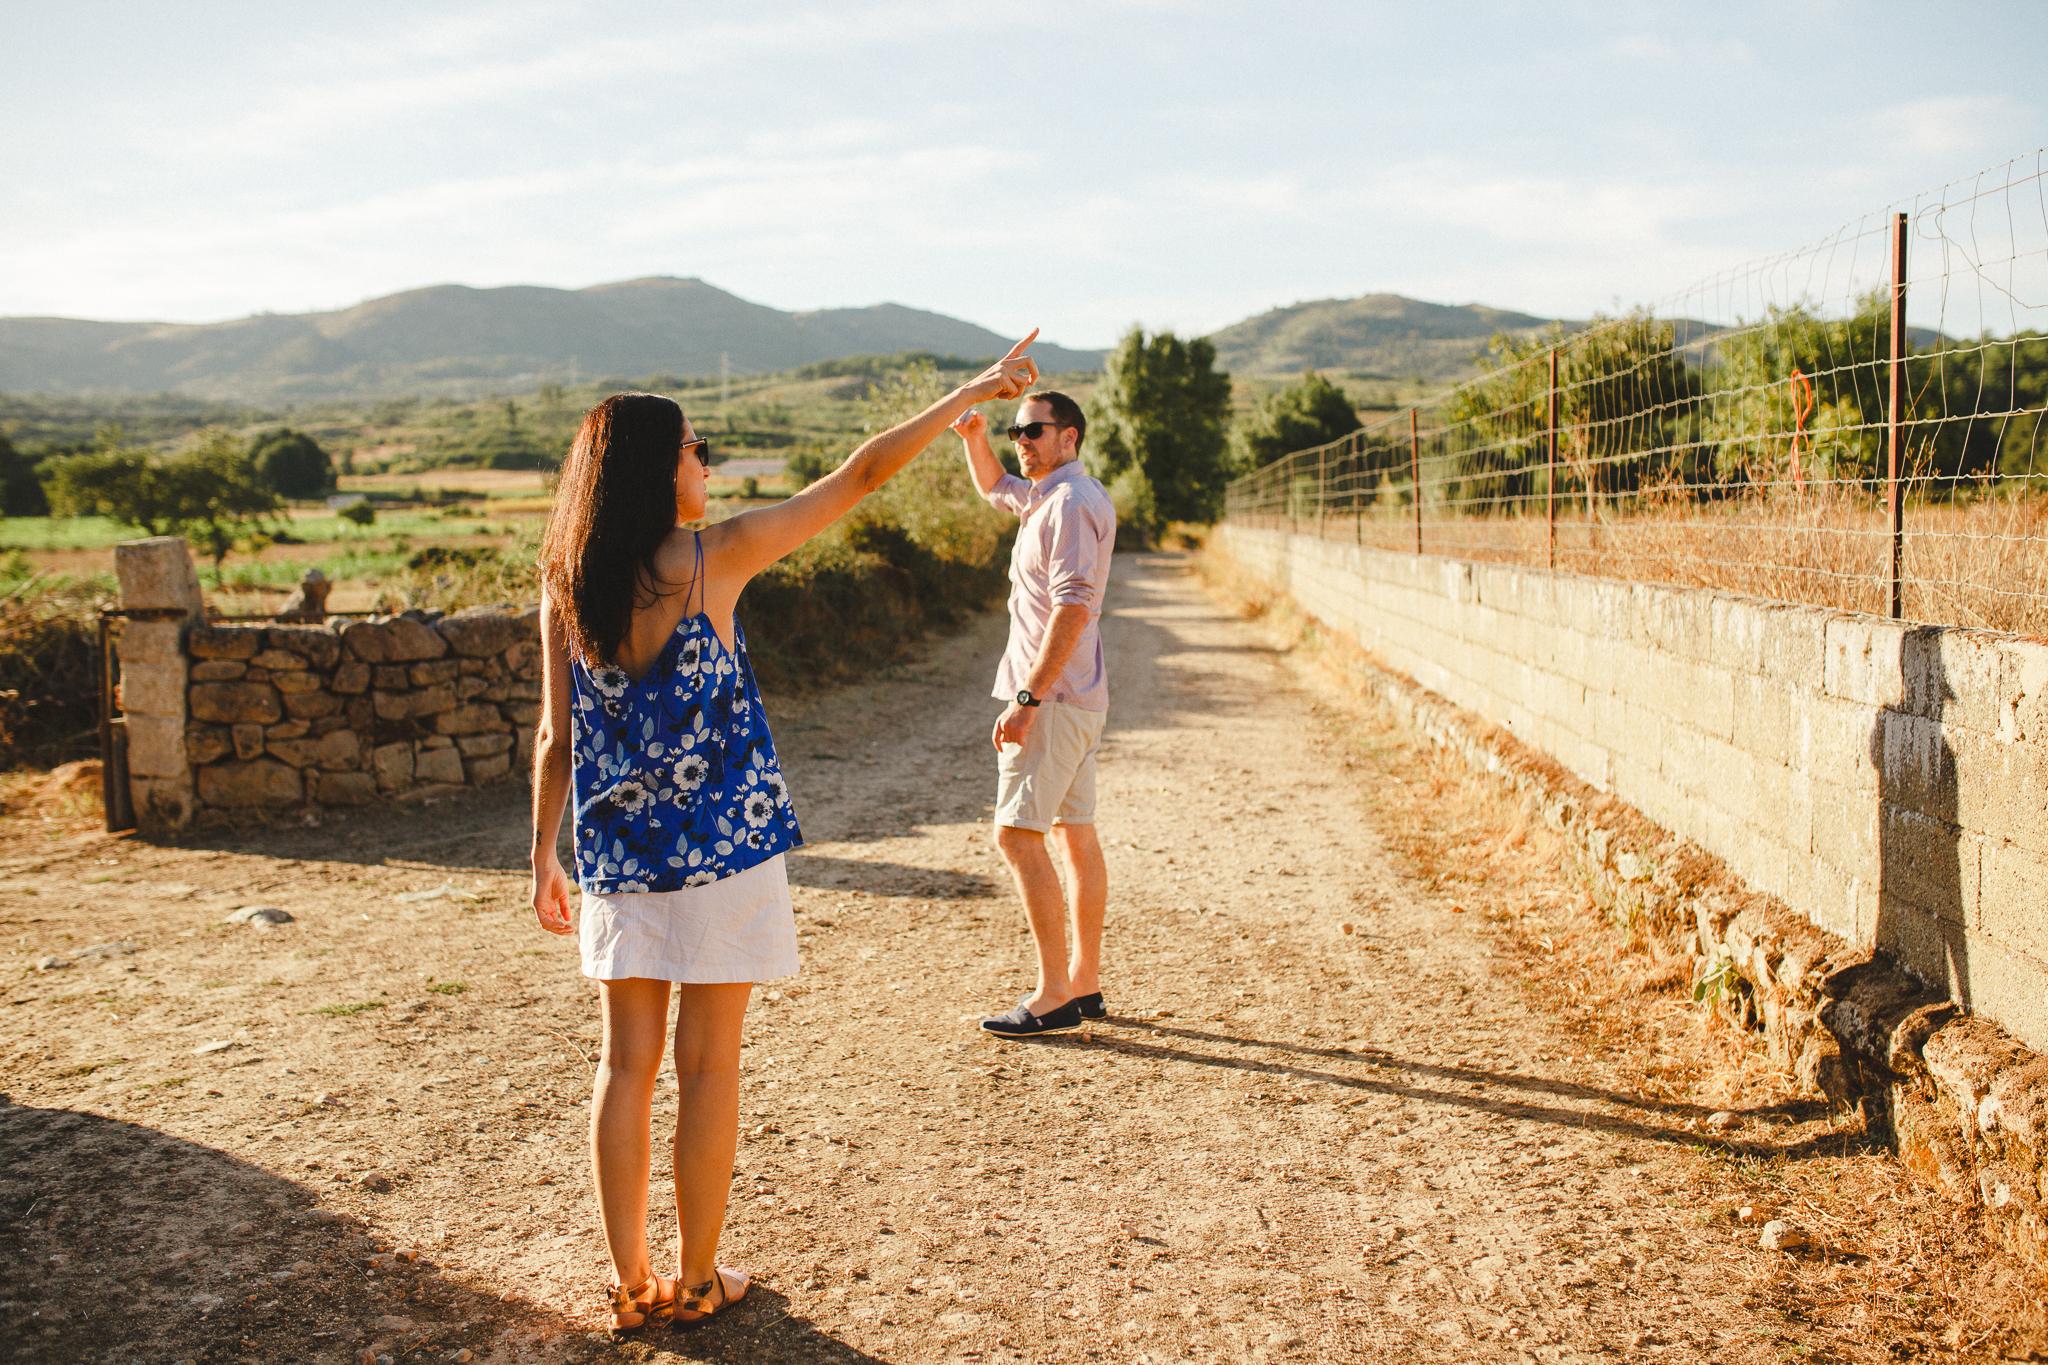 Sessão de Namoro Chaves, Engagement Photo Shoot in Portugal, Fotografia de Casamento Hello Twiggs